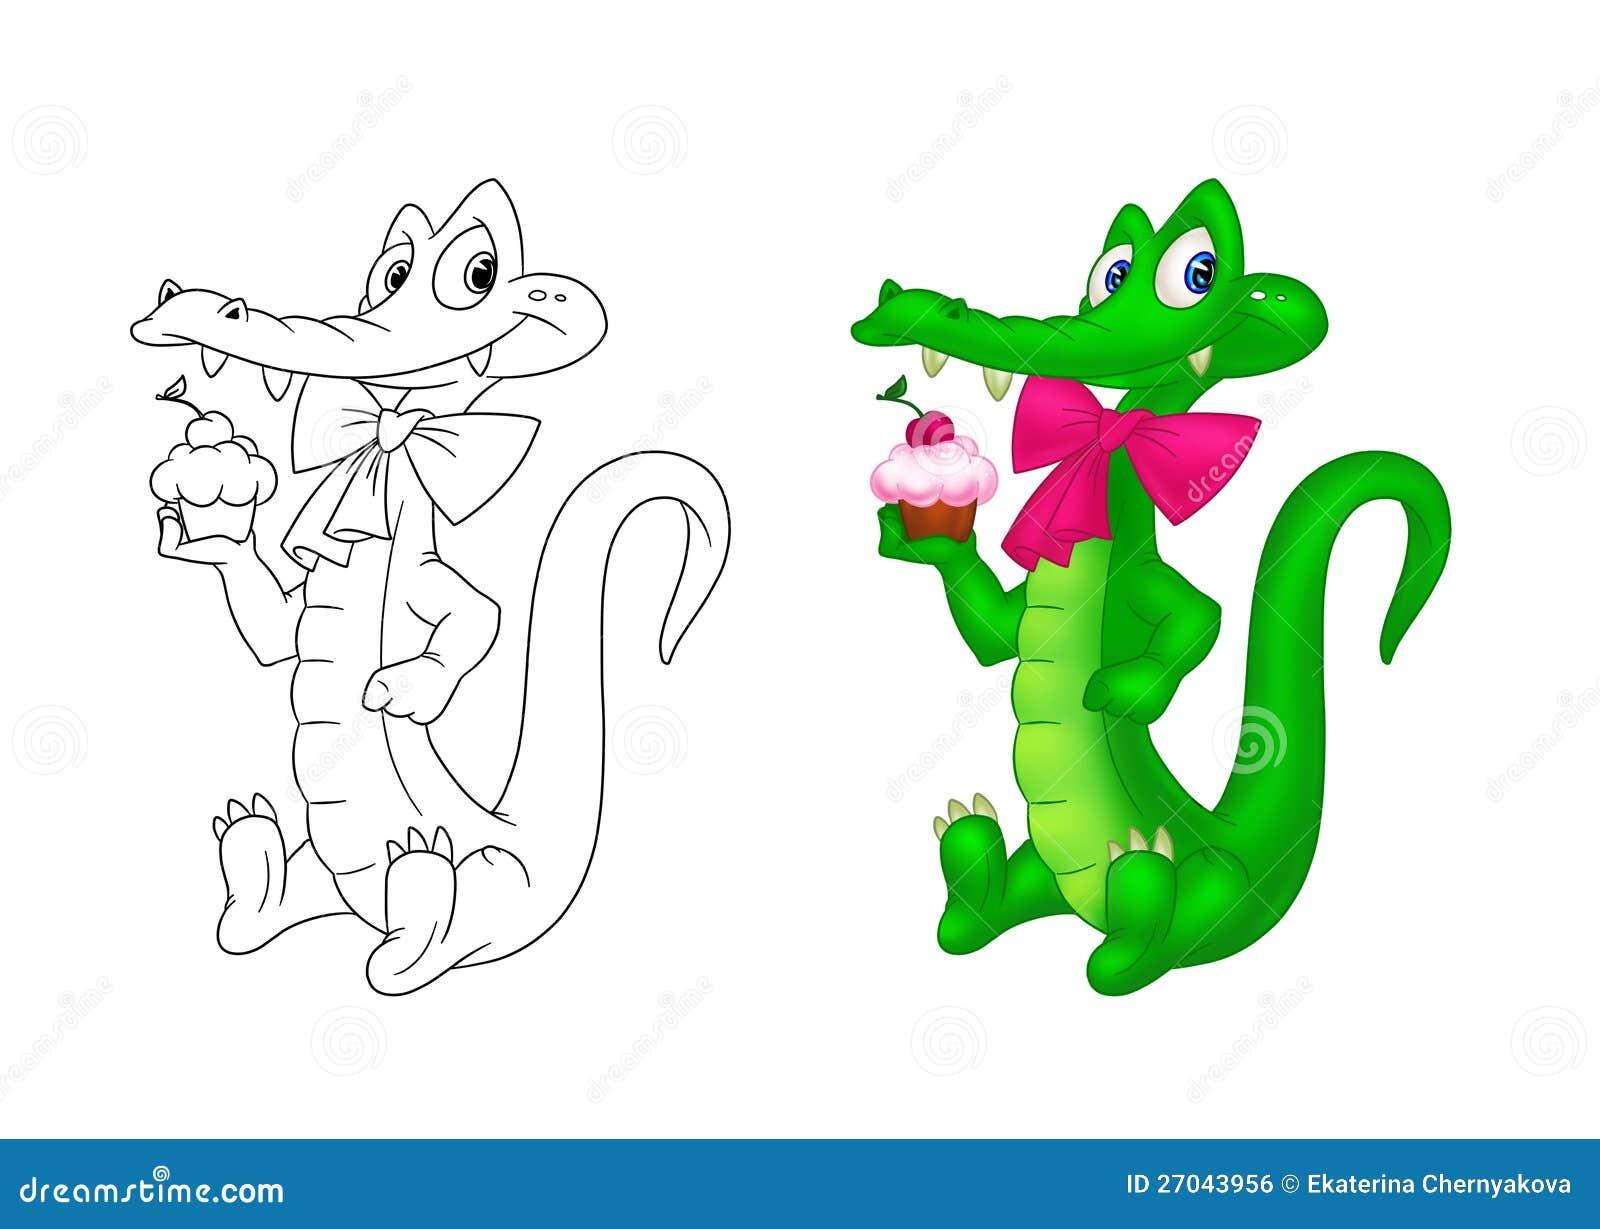 Crocodile Holiday Coloring Page Cartoon Royalty Free Stock Image